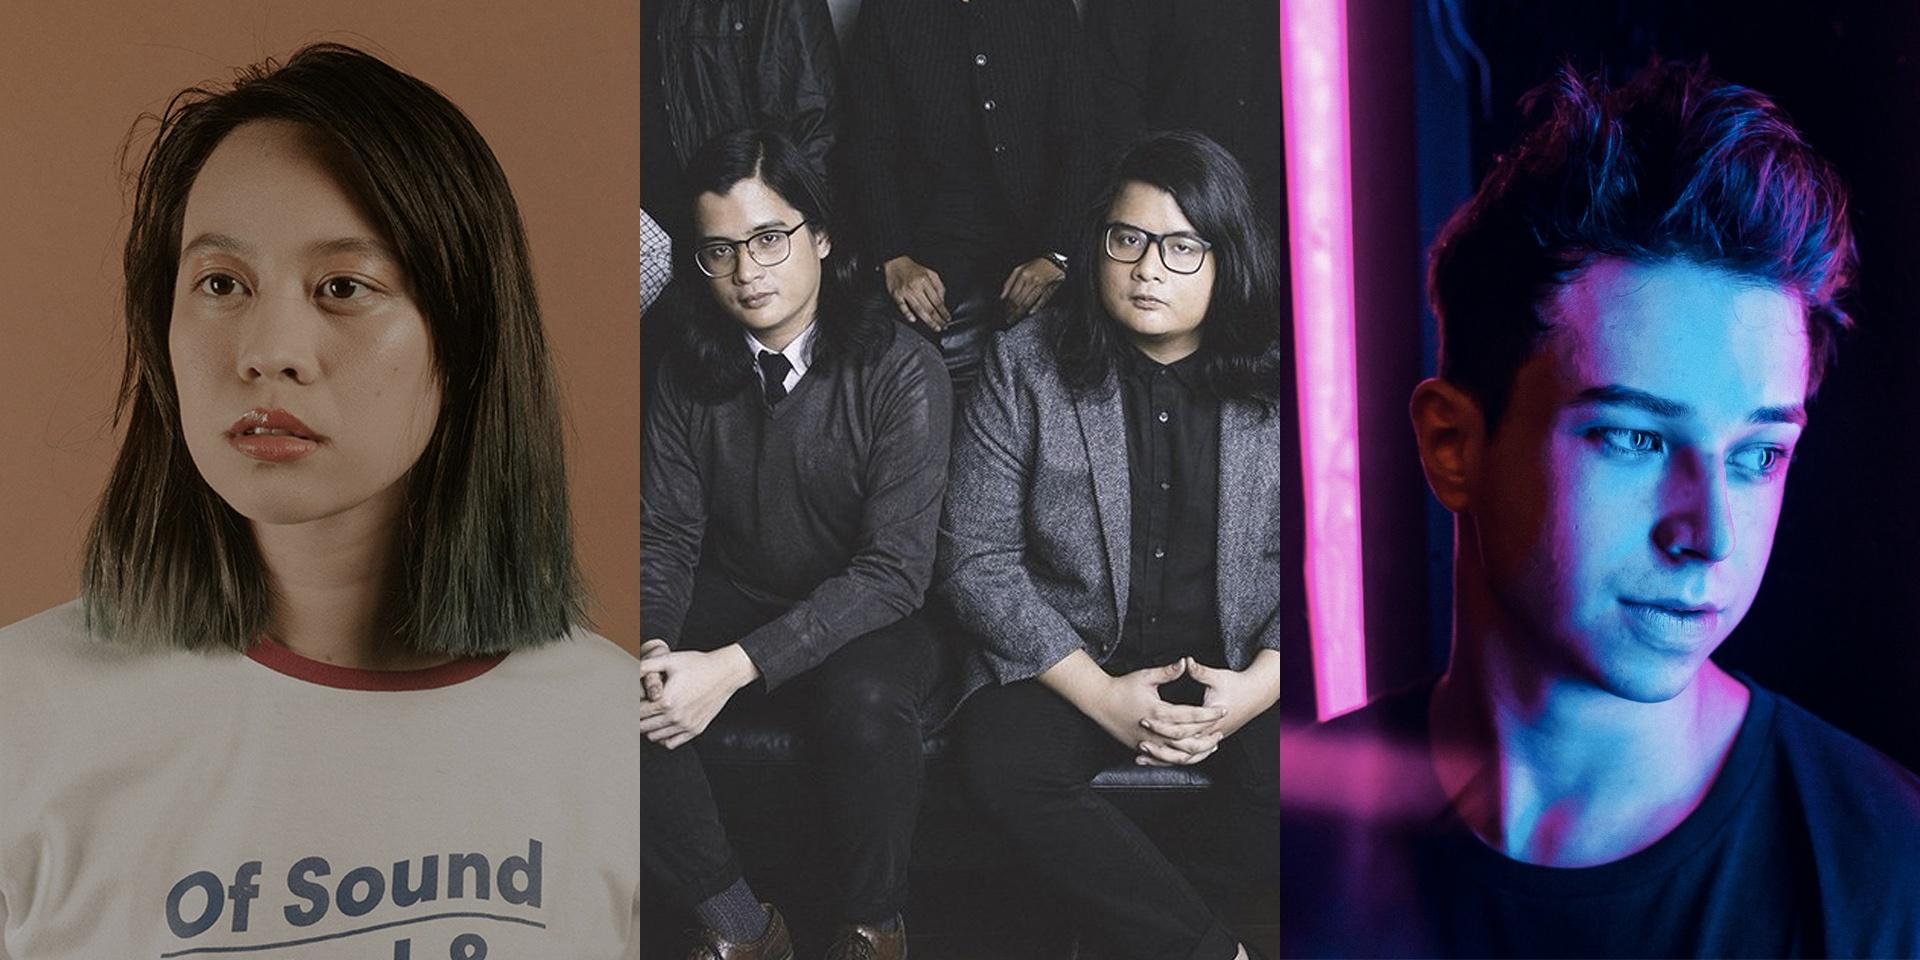 Music Matters 2017 artists Reese Lansangan, Tom Jay Williams, Ben&Ben share their stories with us